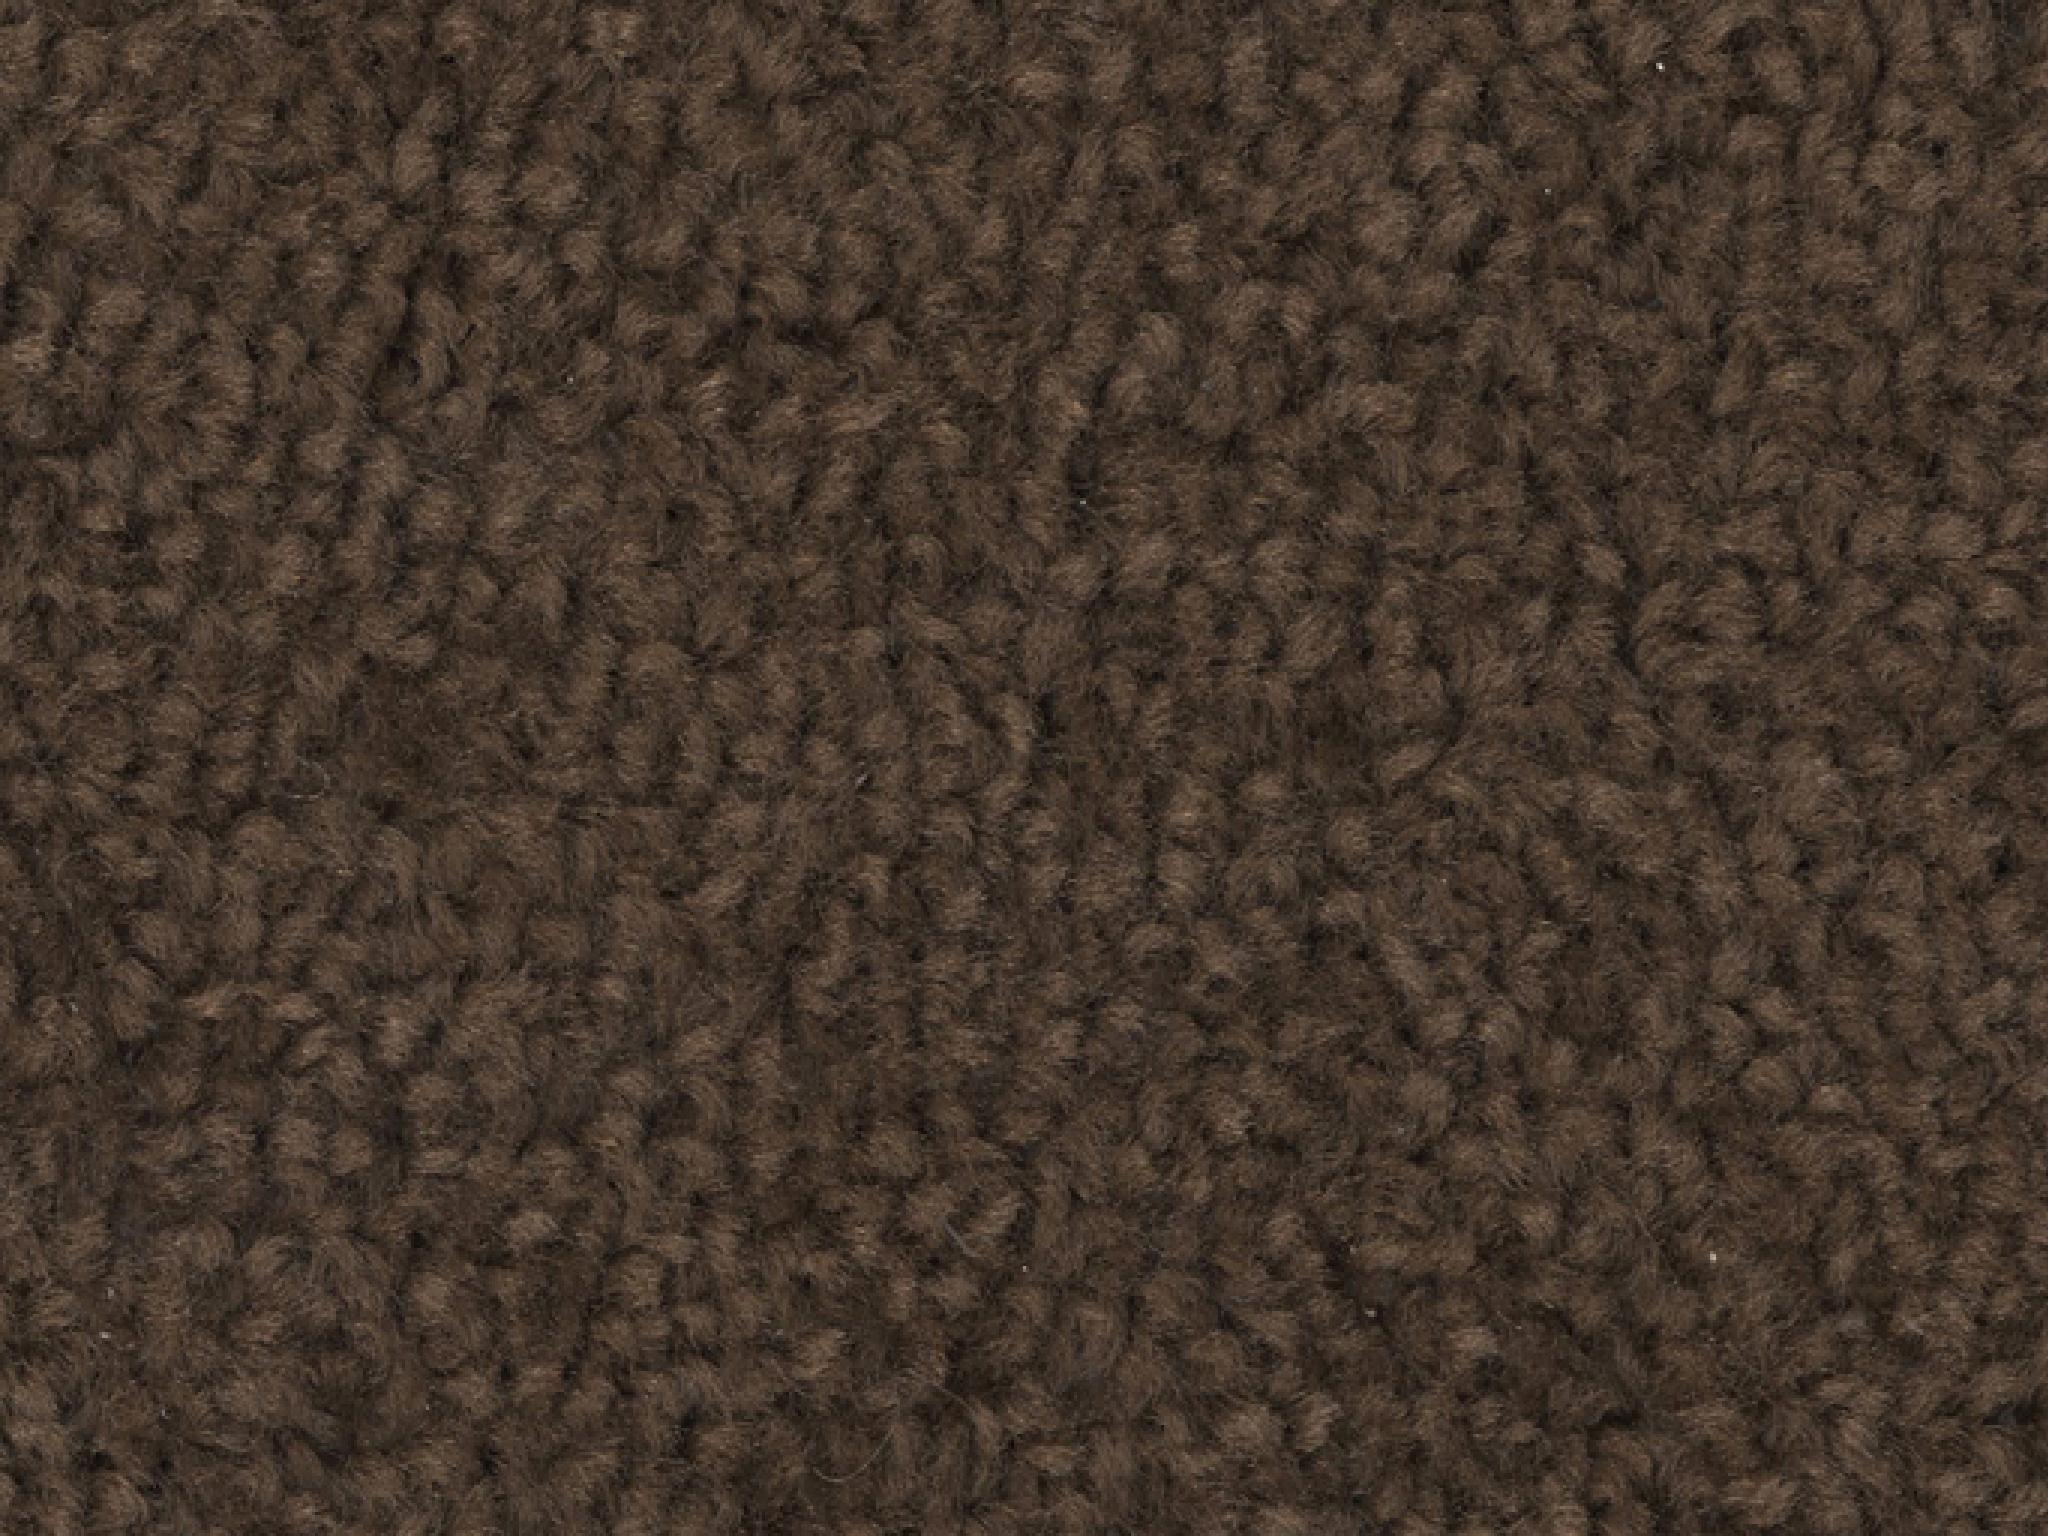 MAY_Decor_Carpet_MountainRidge